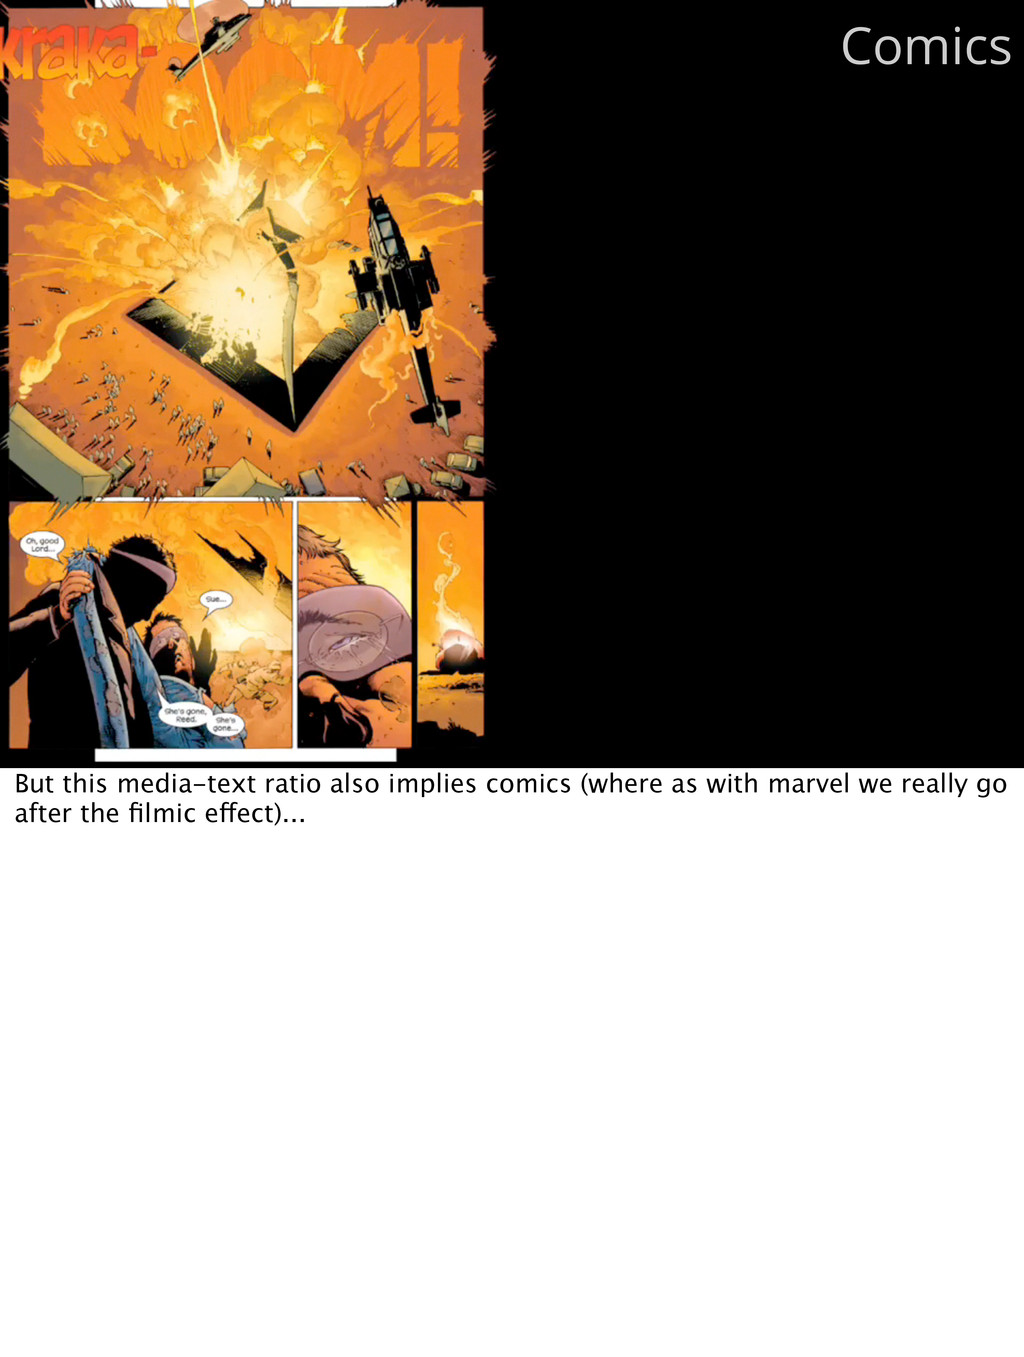 Comics But this media-text ratio also implies c...